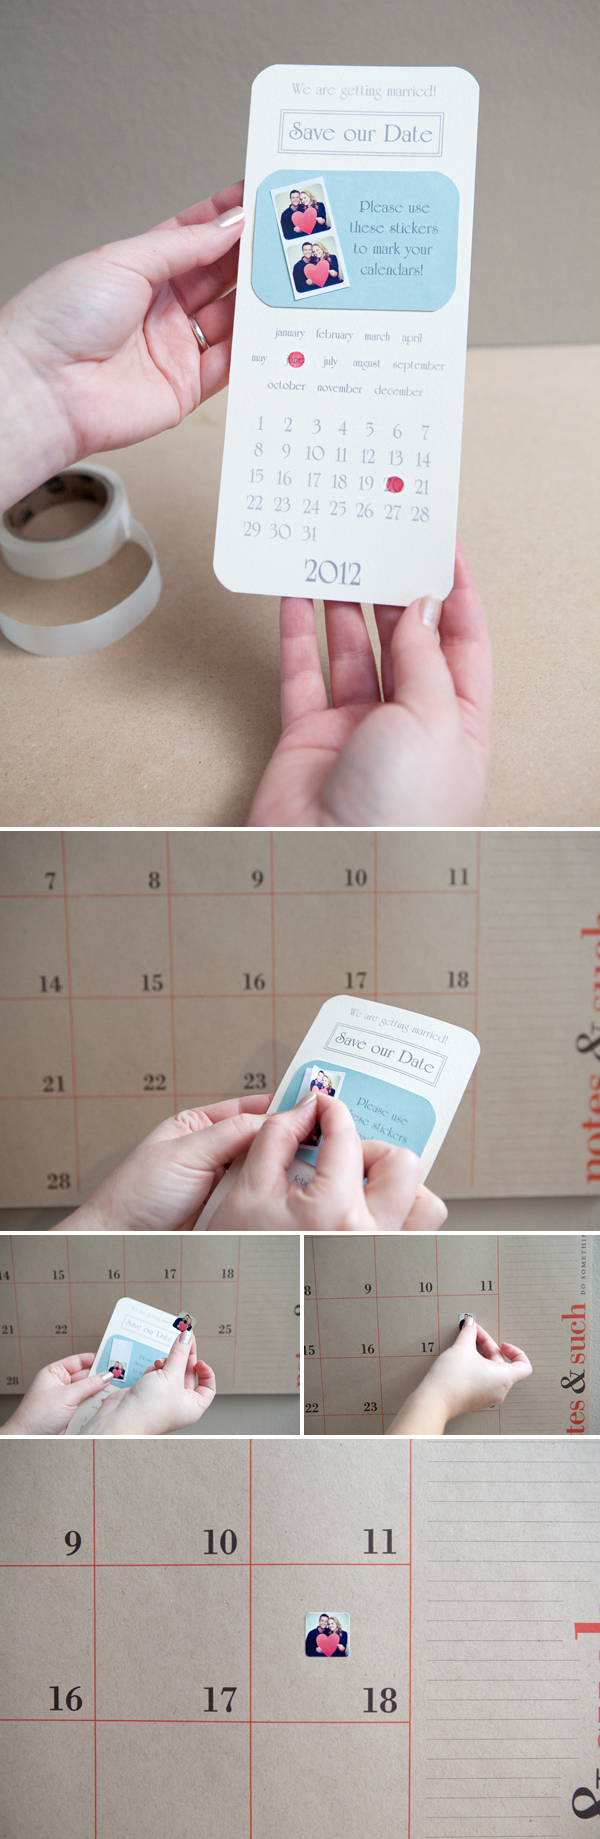 Instagram Sticker Save-the-Date Invitations